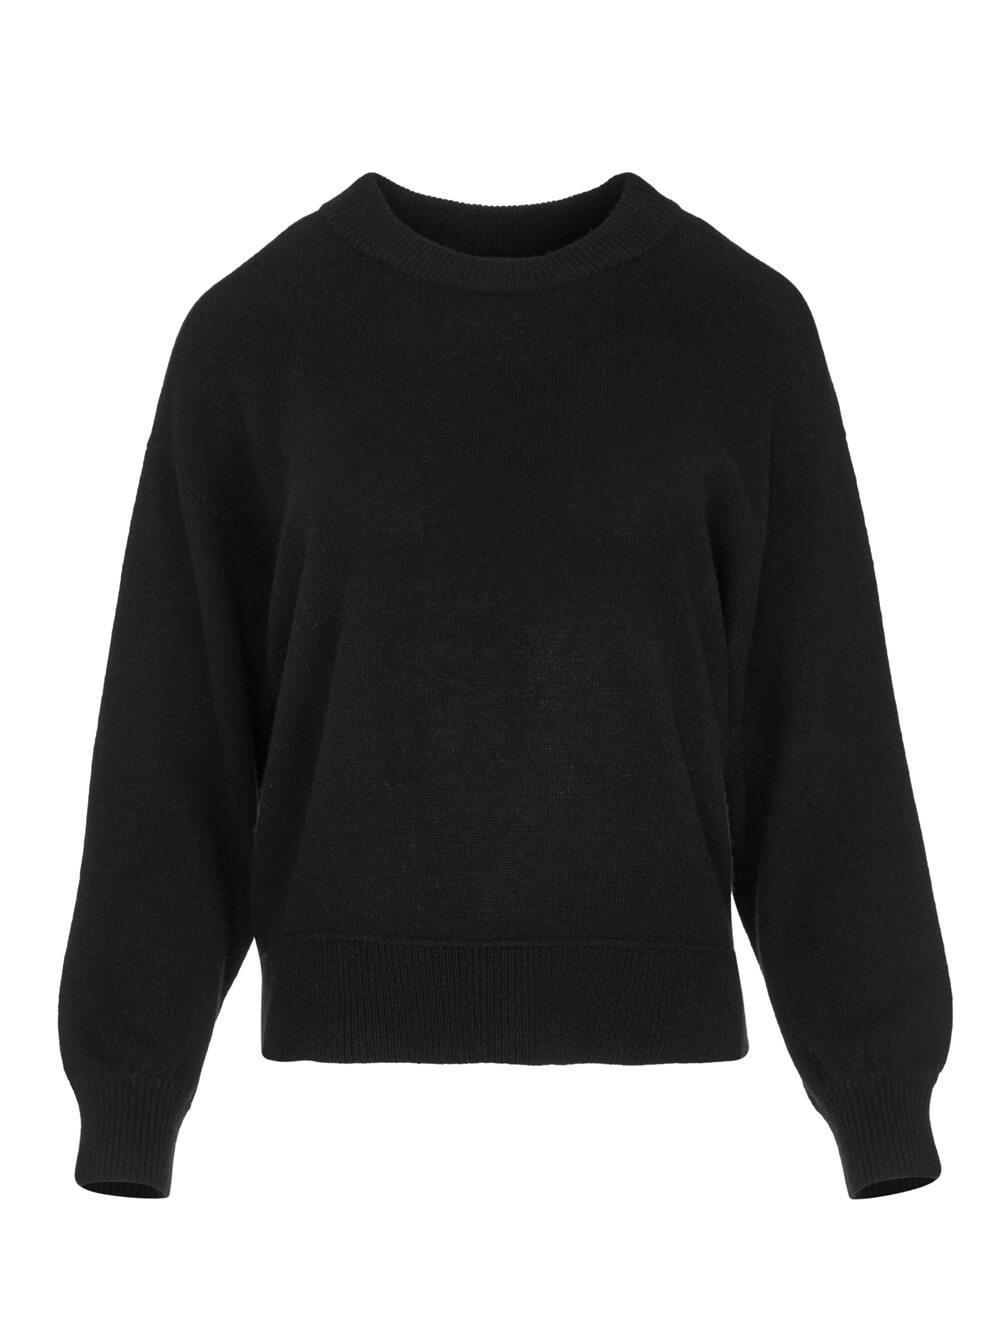 Denver Cashmere Sweater